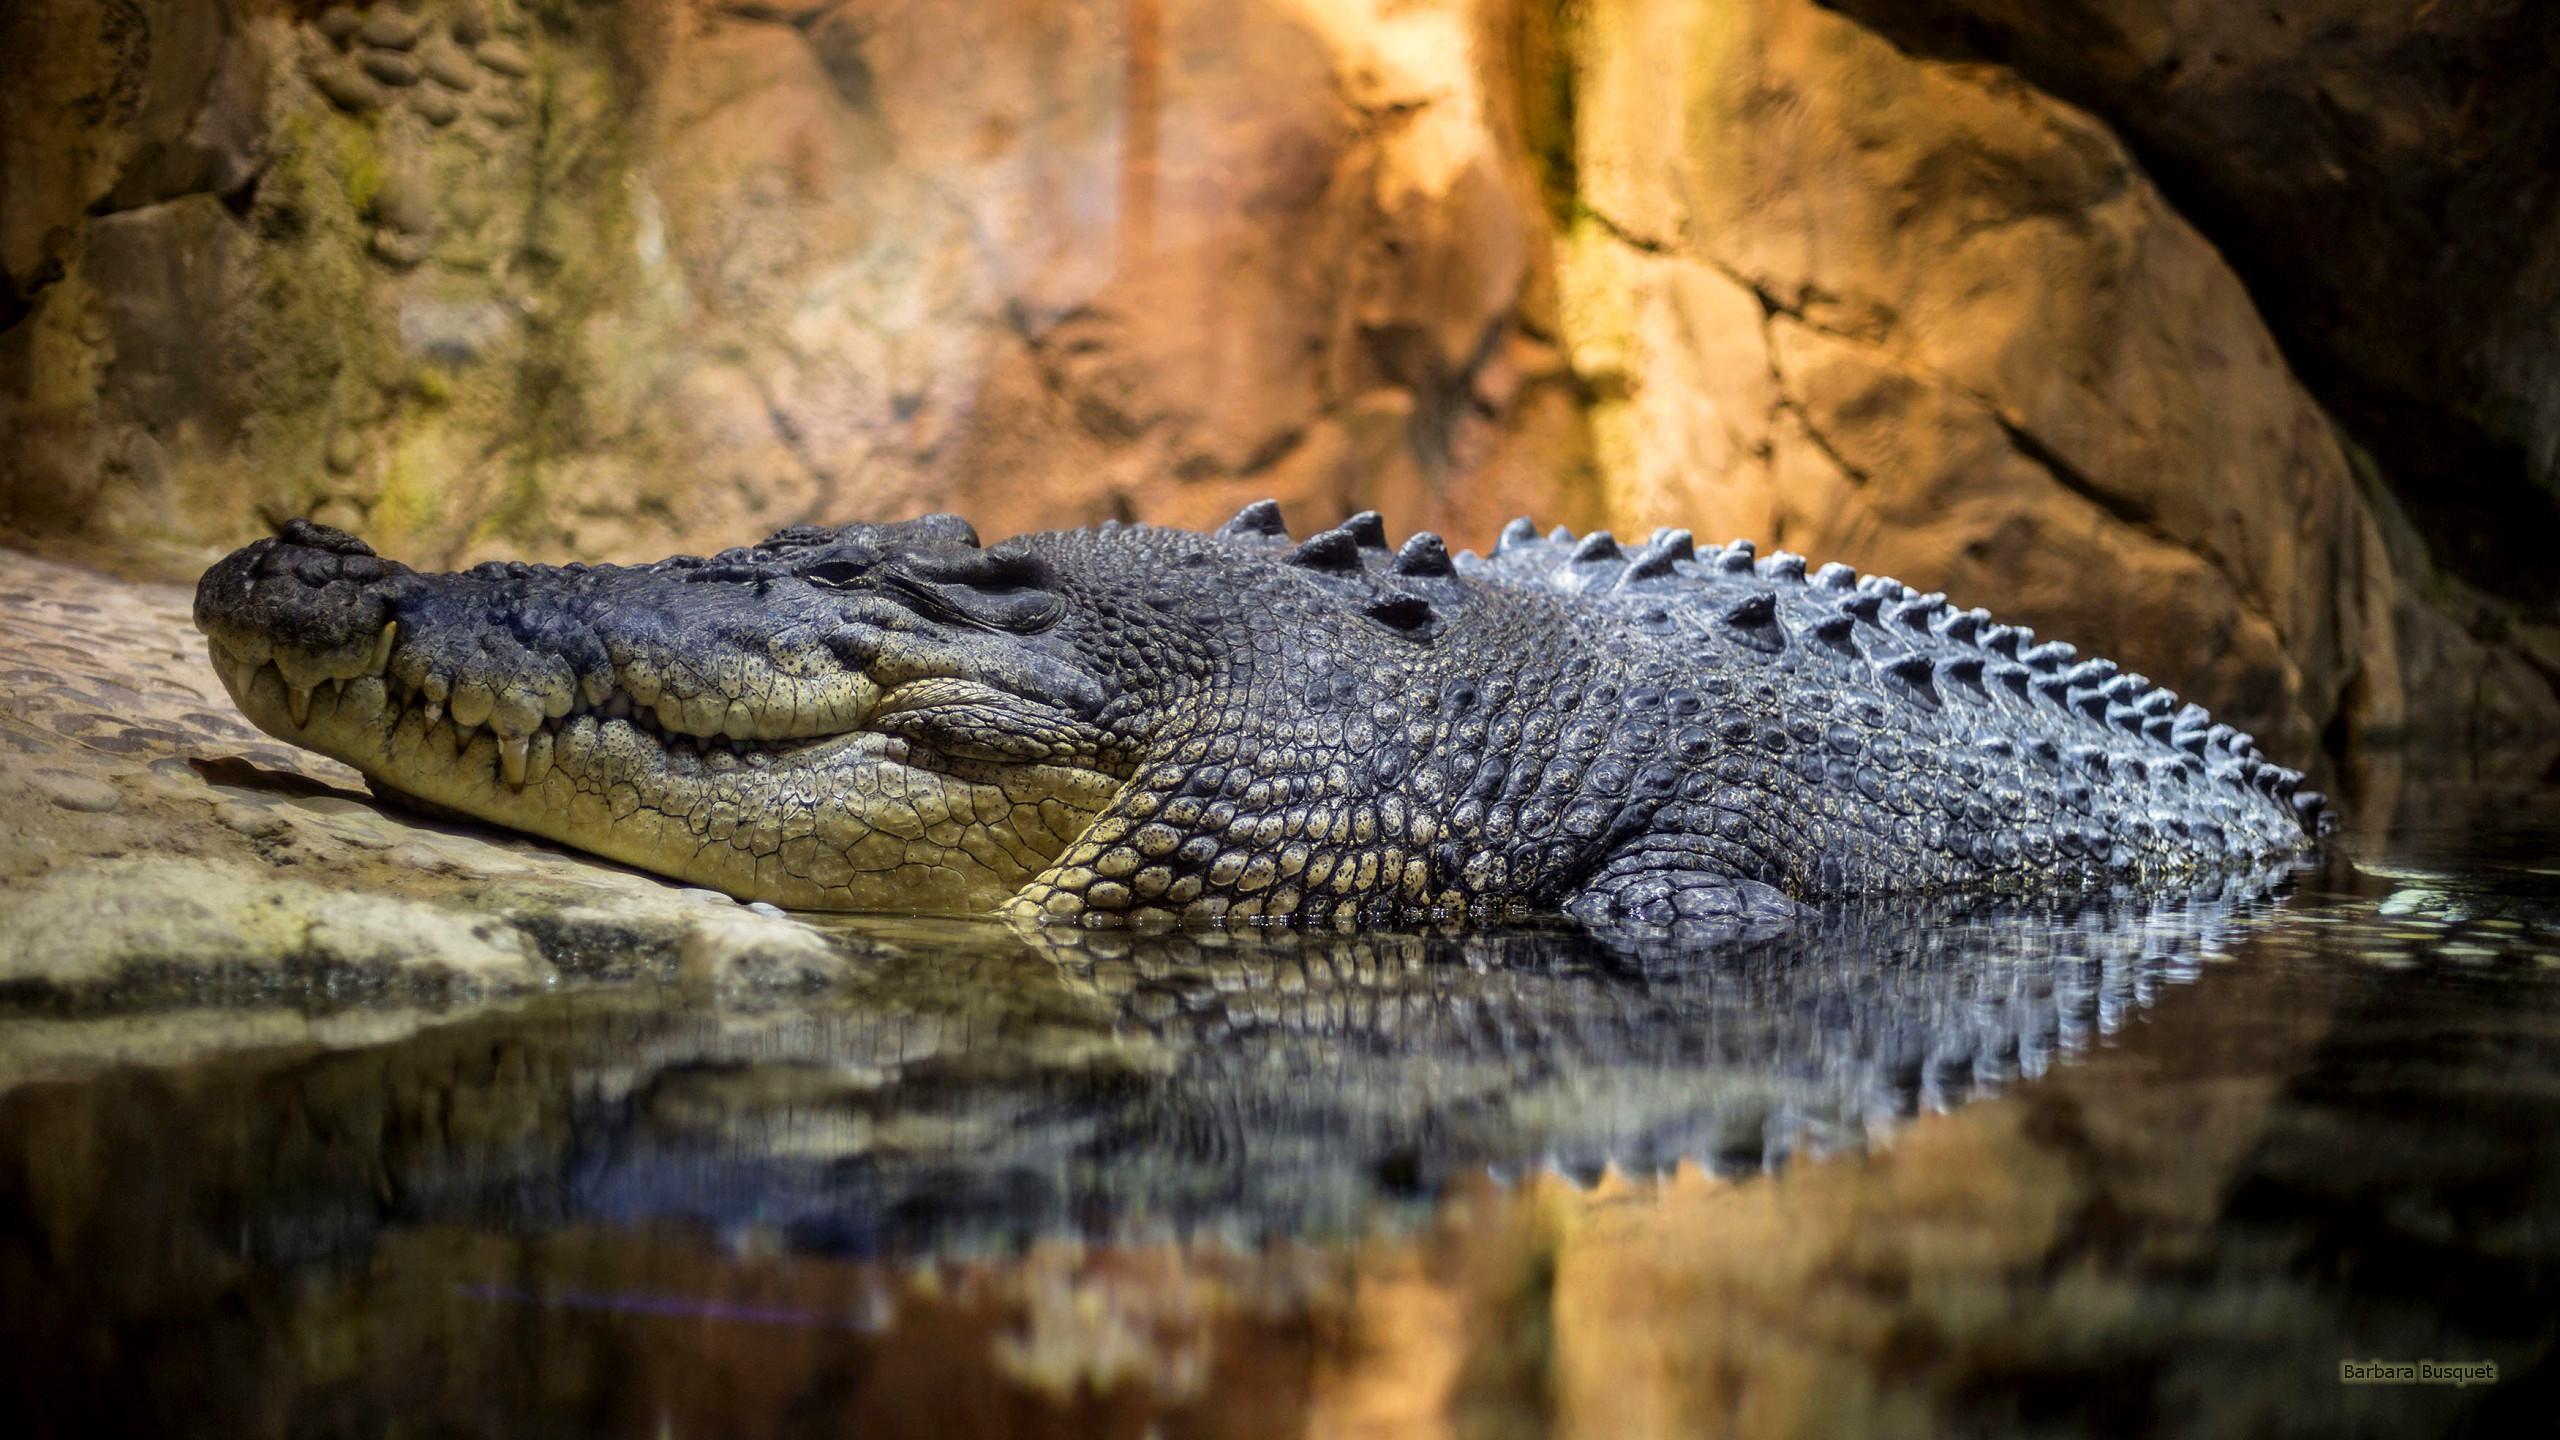 Crocodile Wallpaper (73+ images)